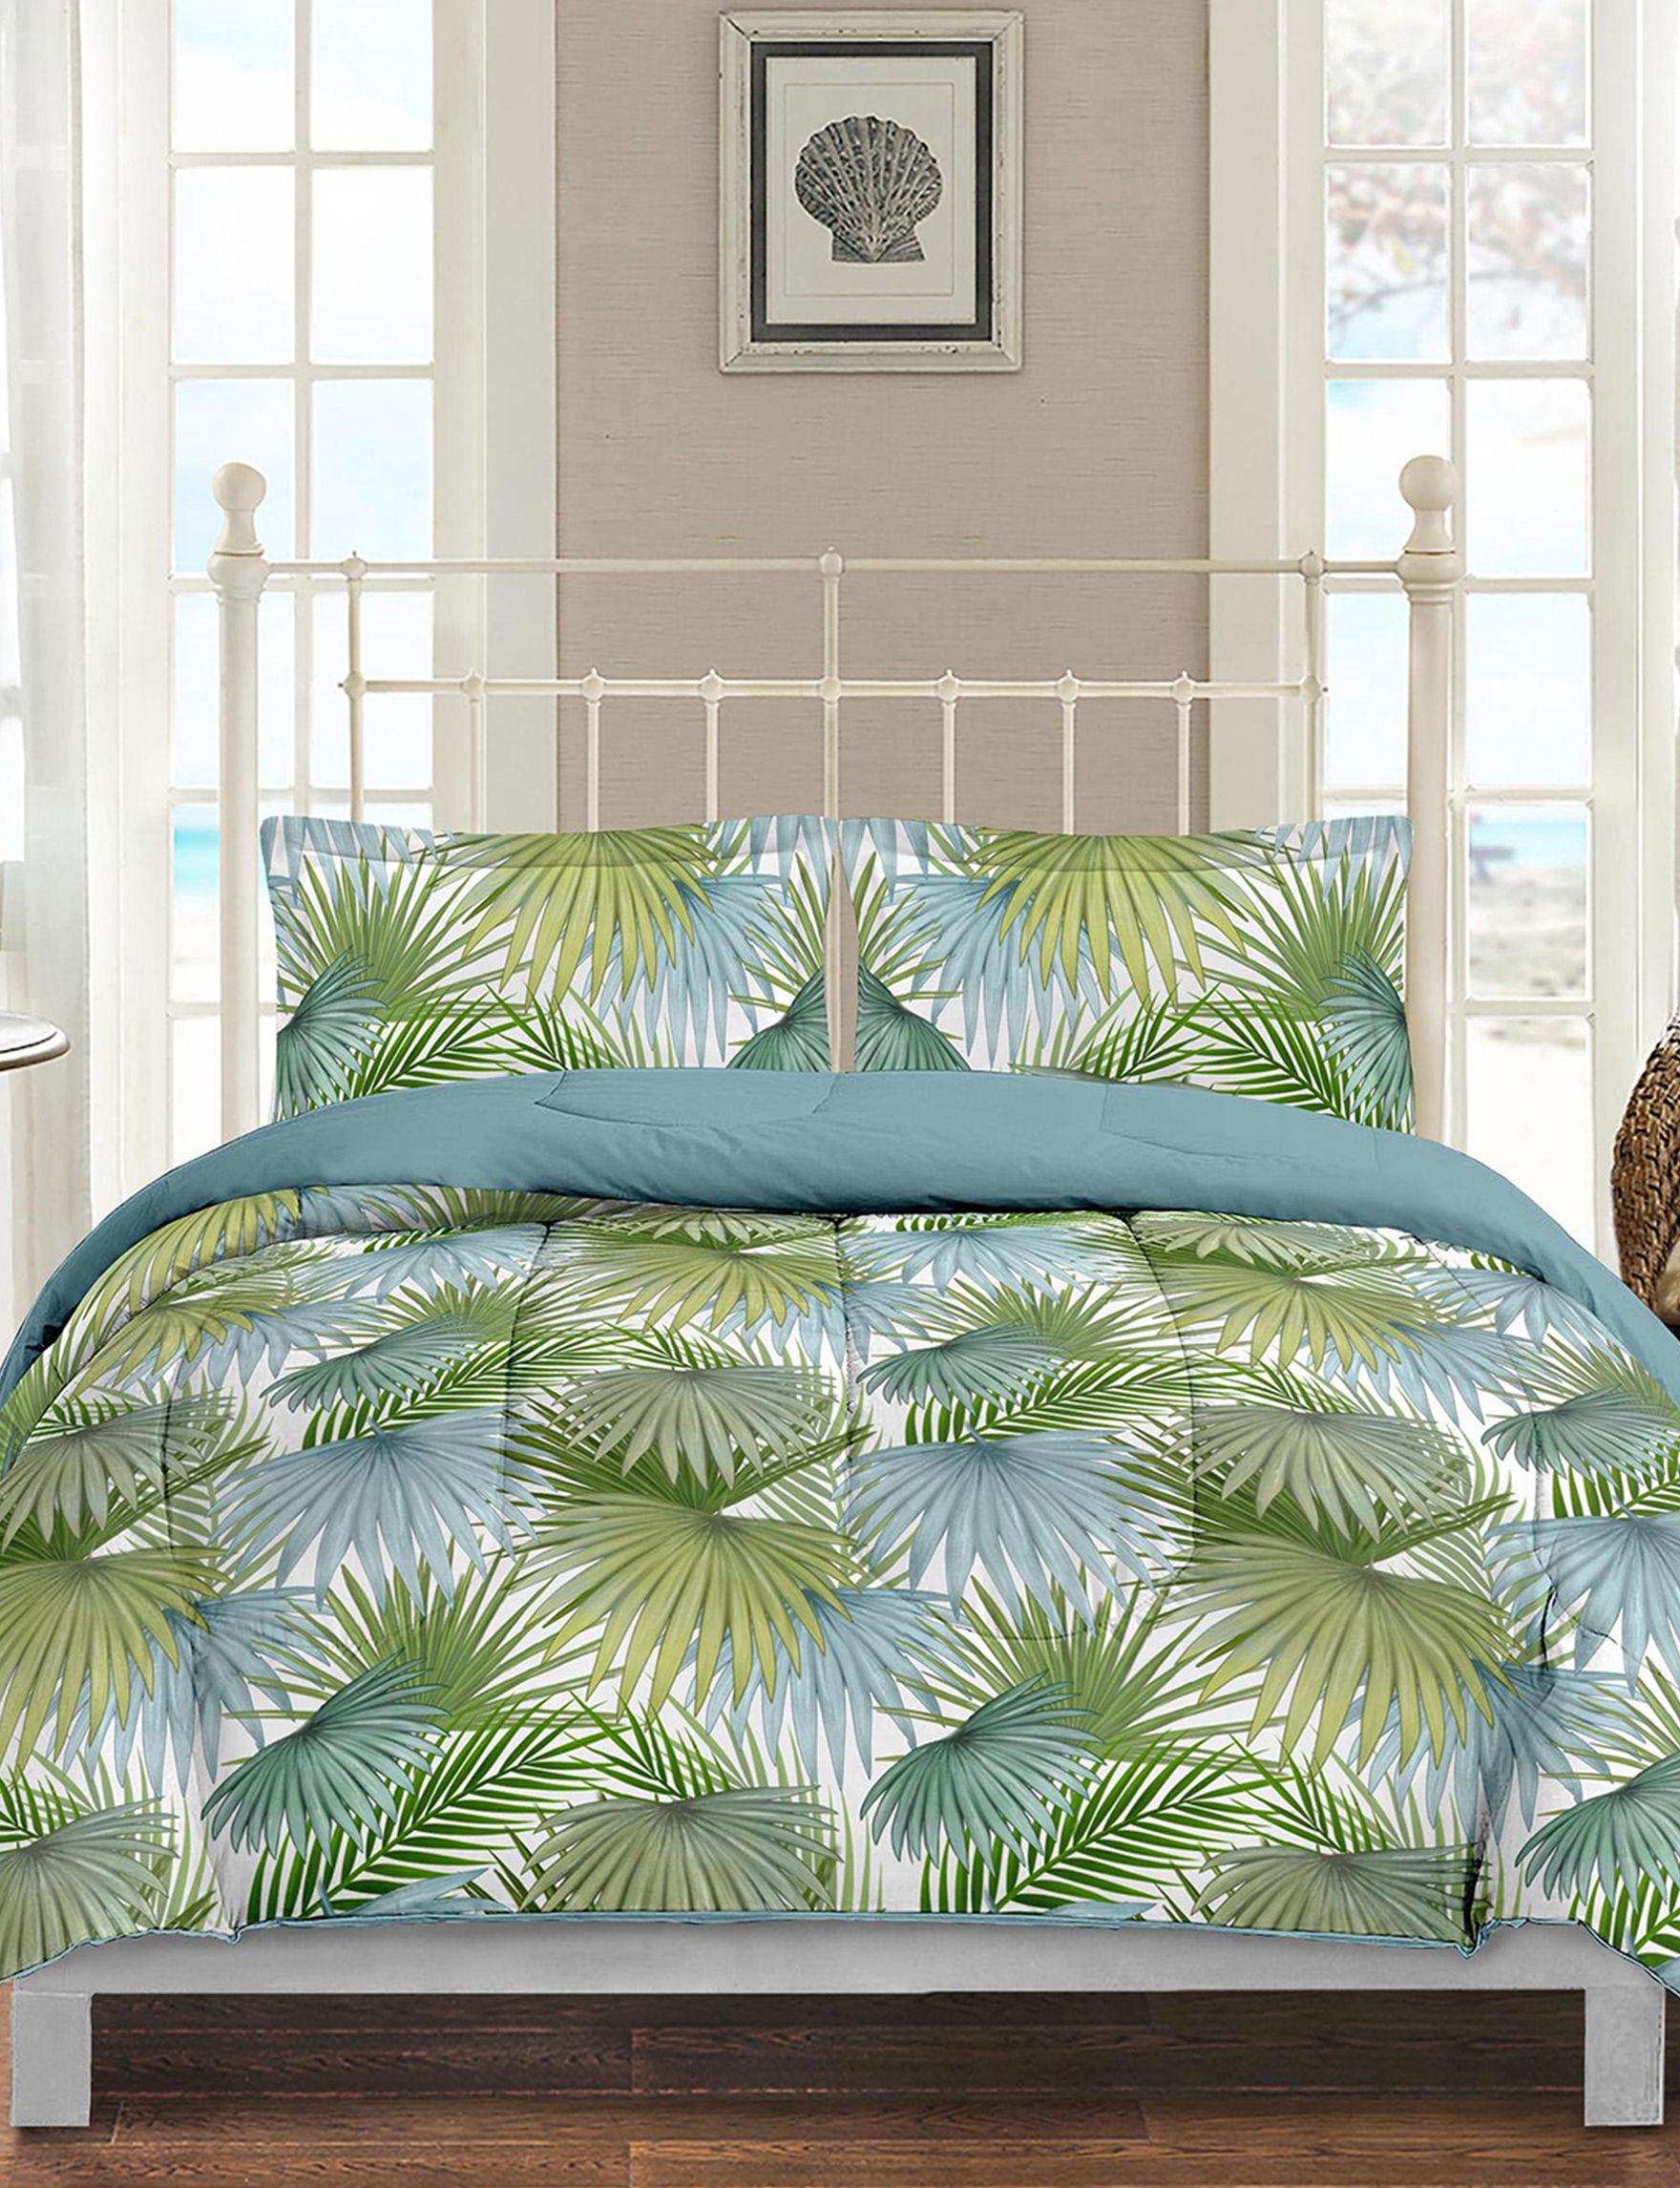 Caribbean Joe Multi Comforters & Comforter Sets